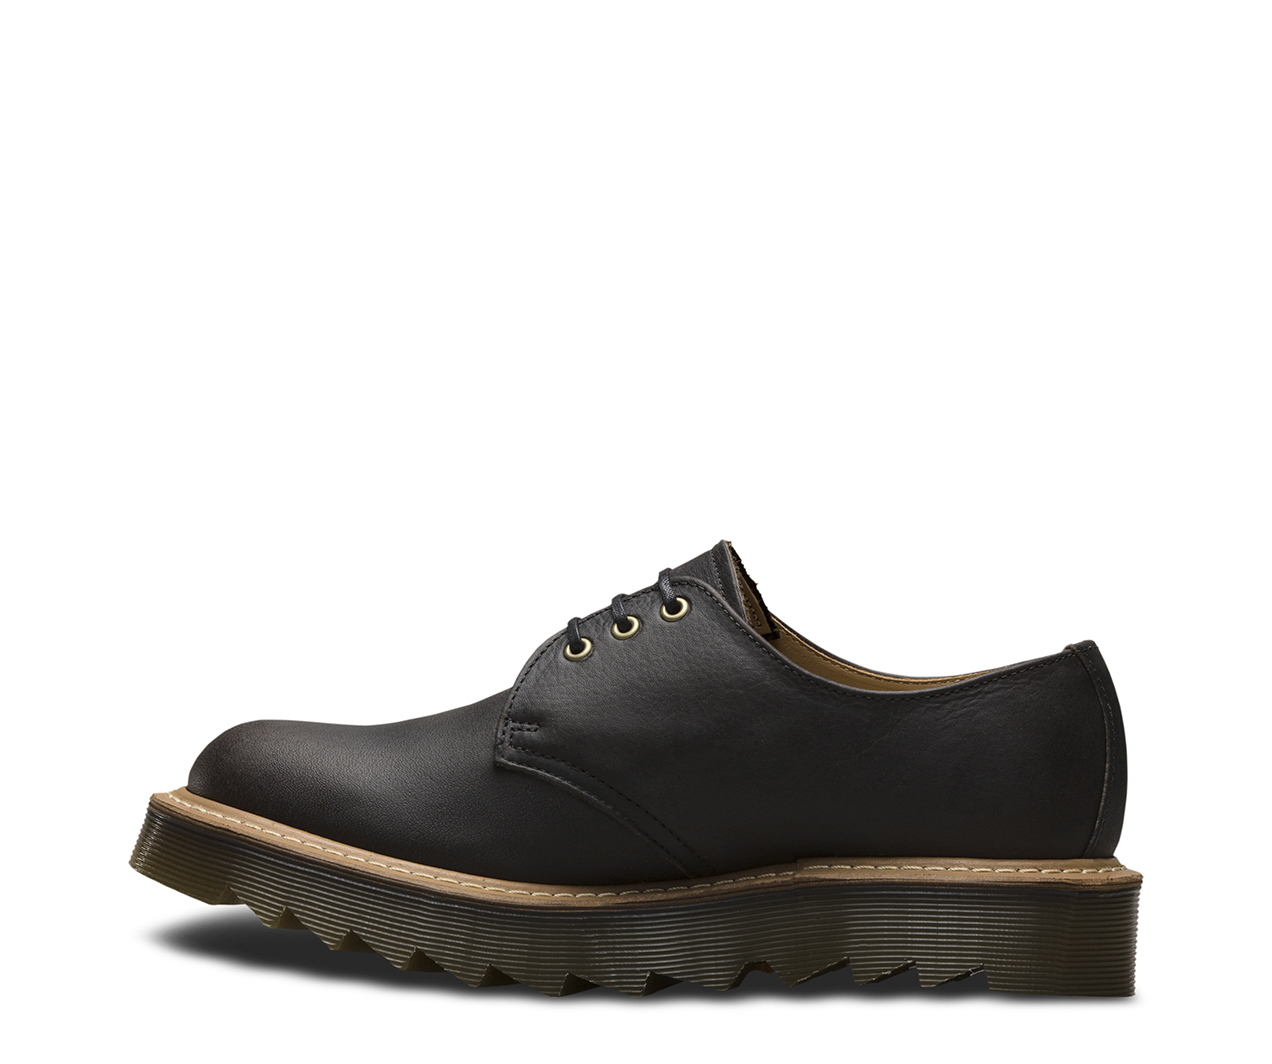 66ea9d67c1d Rippled Semi Casual Shoe Casual shoes t